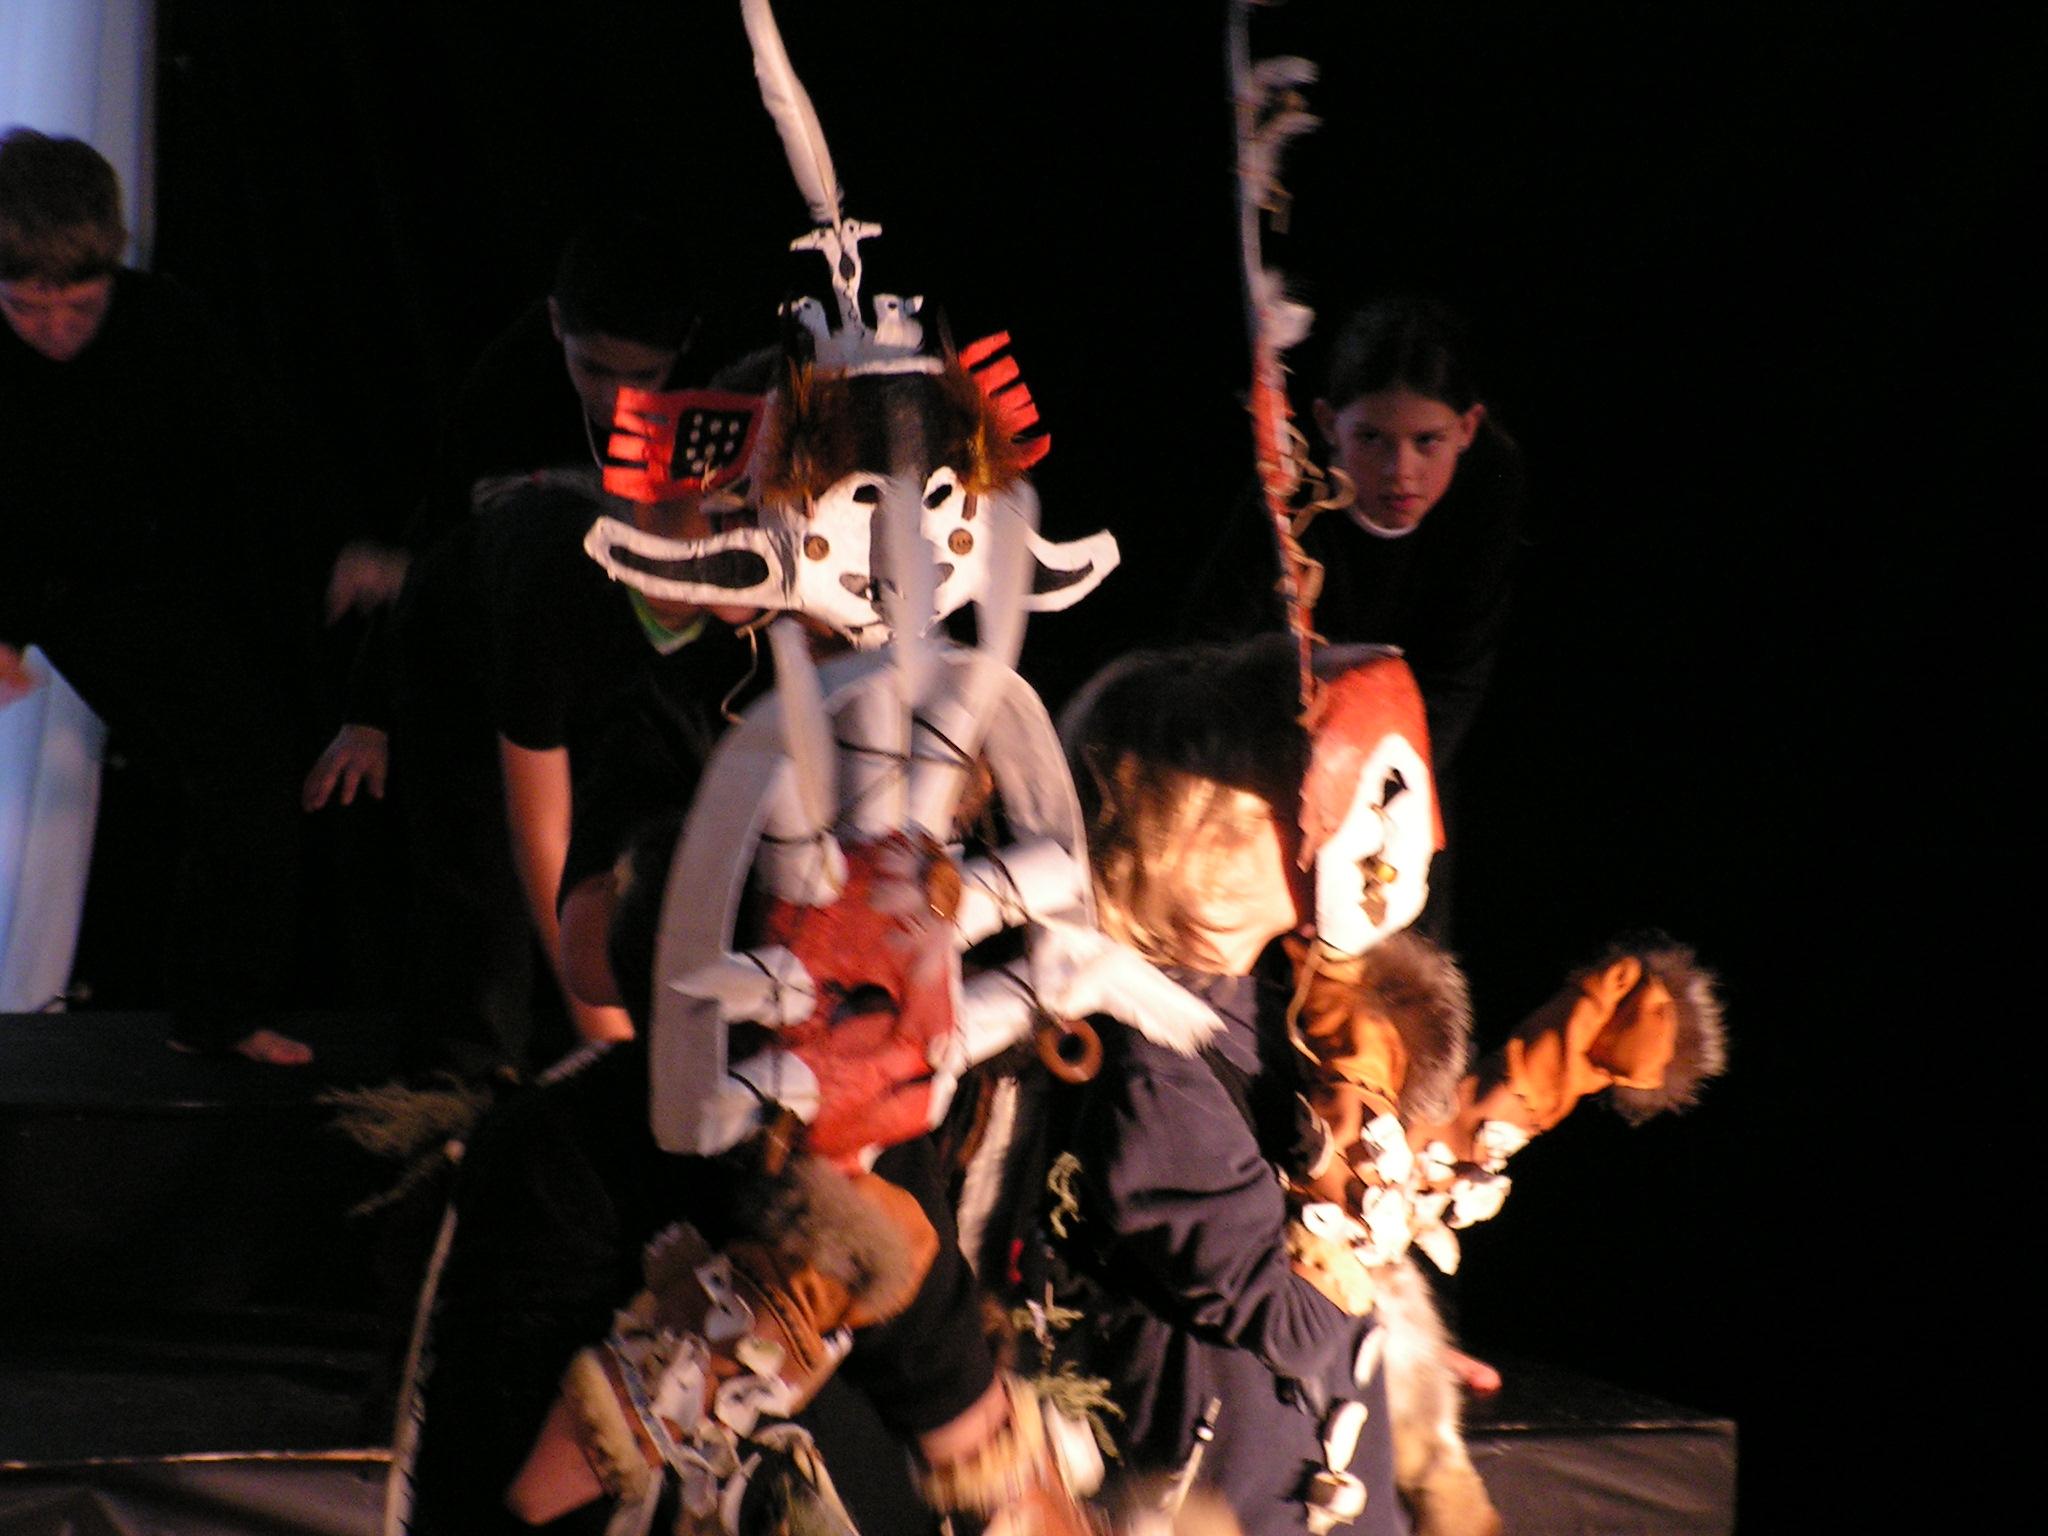 JCCS AIS 2005 - Luke Brockmann, Franklin Rones, and Nicholas Tragis as the shamans.jpg